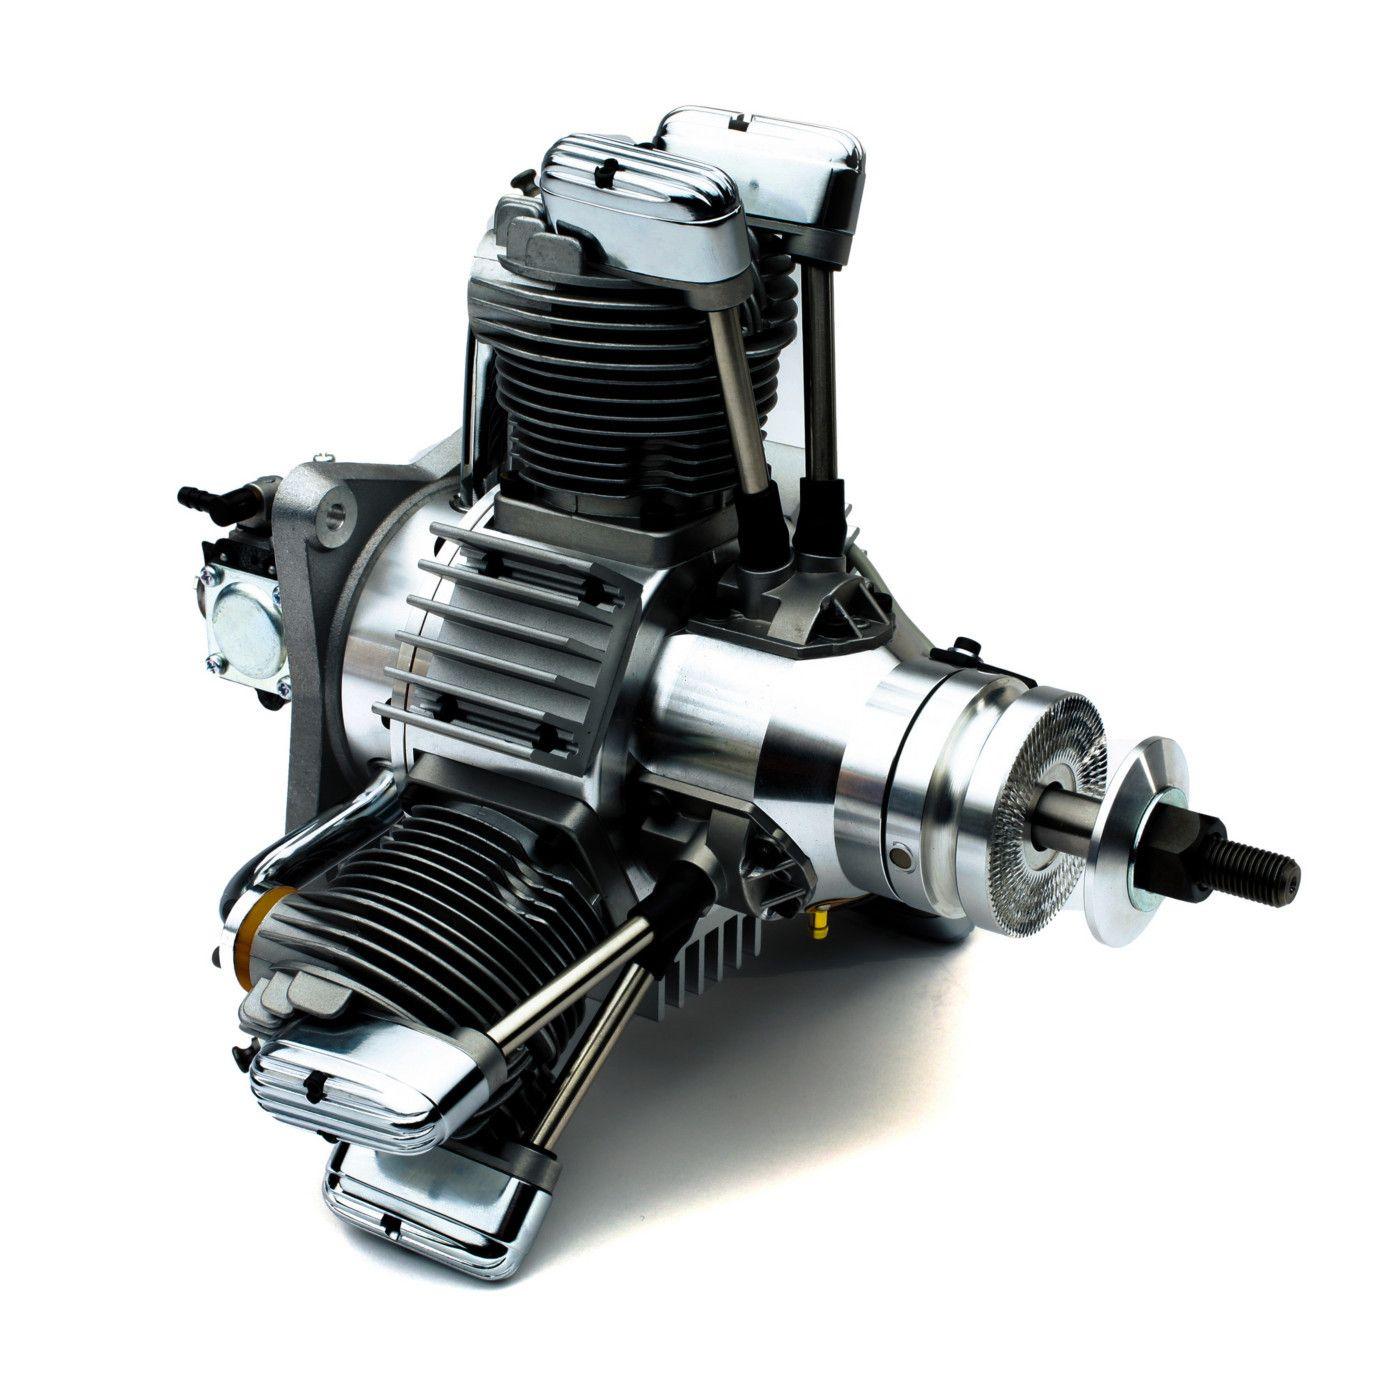 84cc 3-Cylinder Gas Radial Engine: BR | HorizonHobby